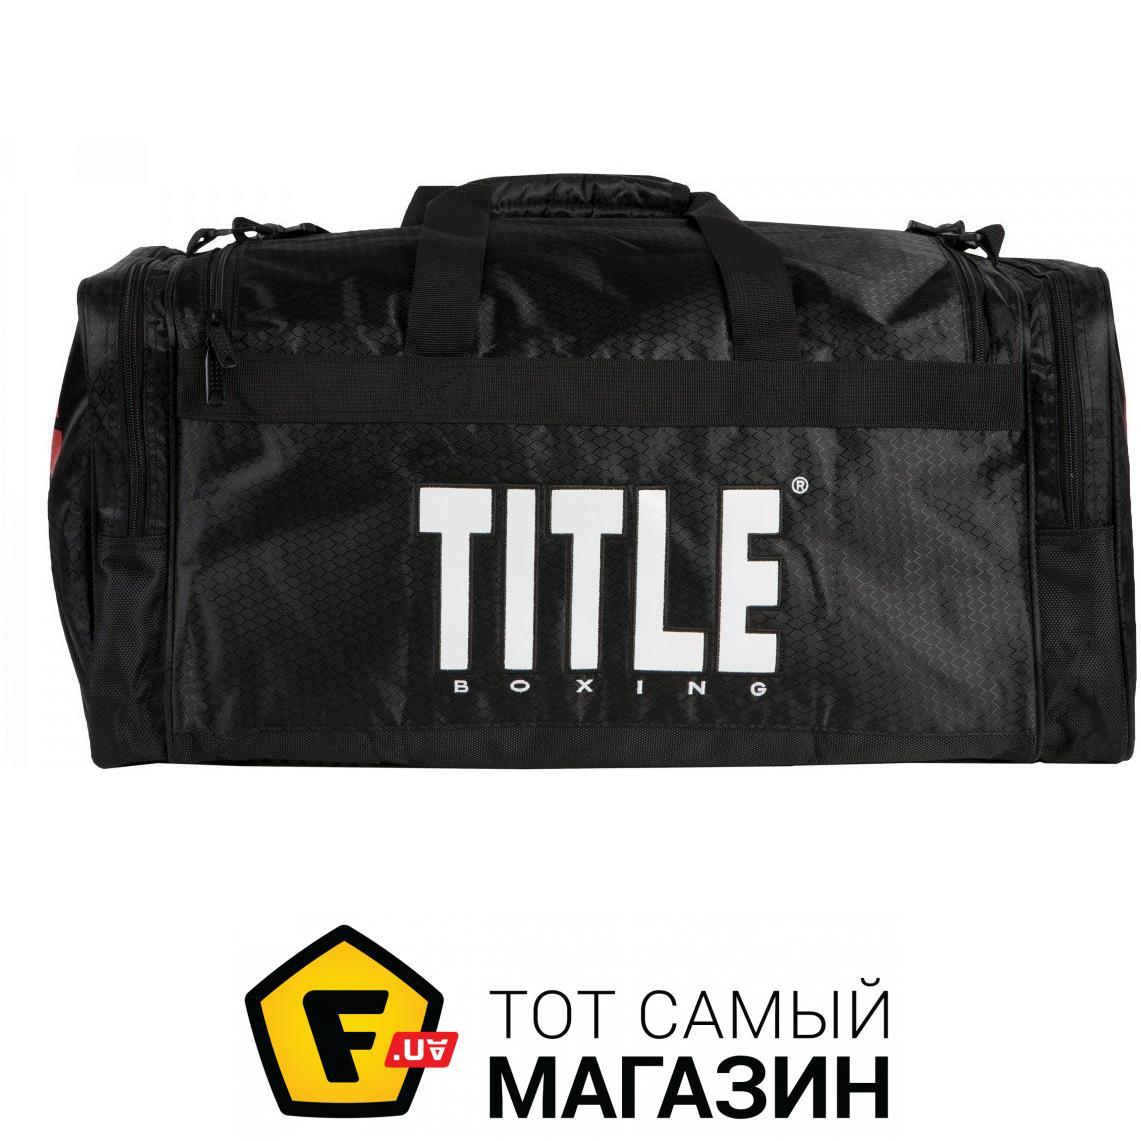 dd3068388238 Title Boxing Deluxe Gear Bag 2.0 черный (TBAG24) Назначение: для бокса, для